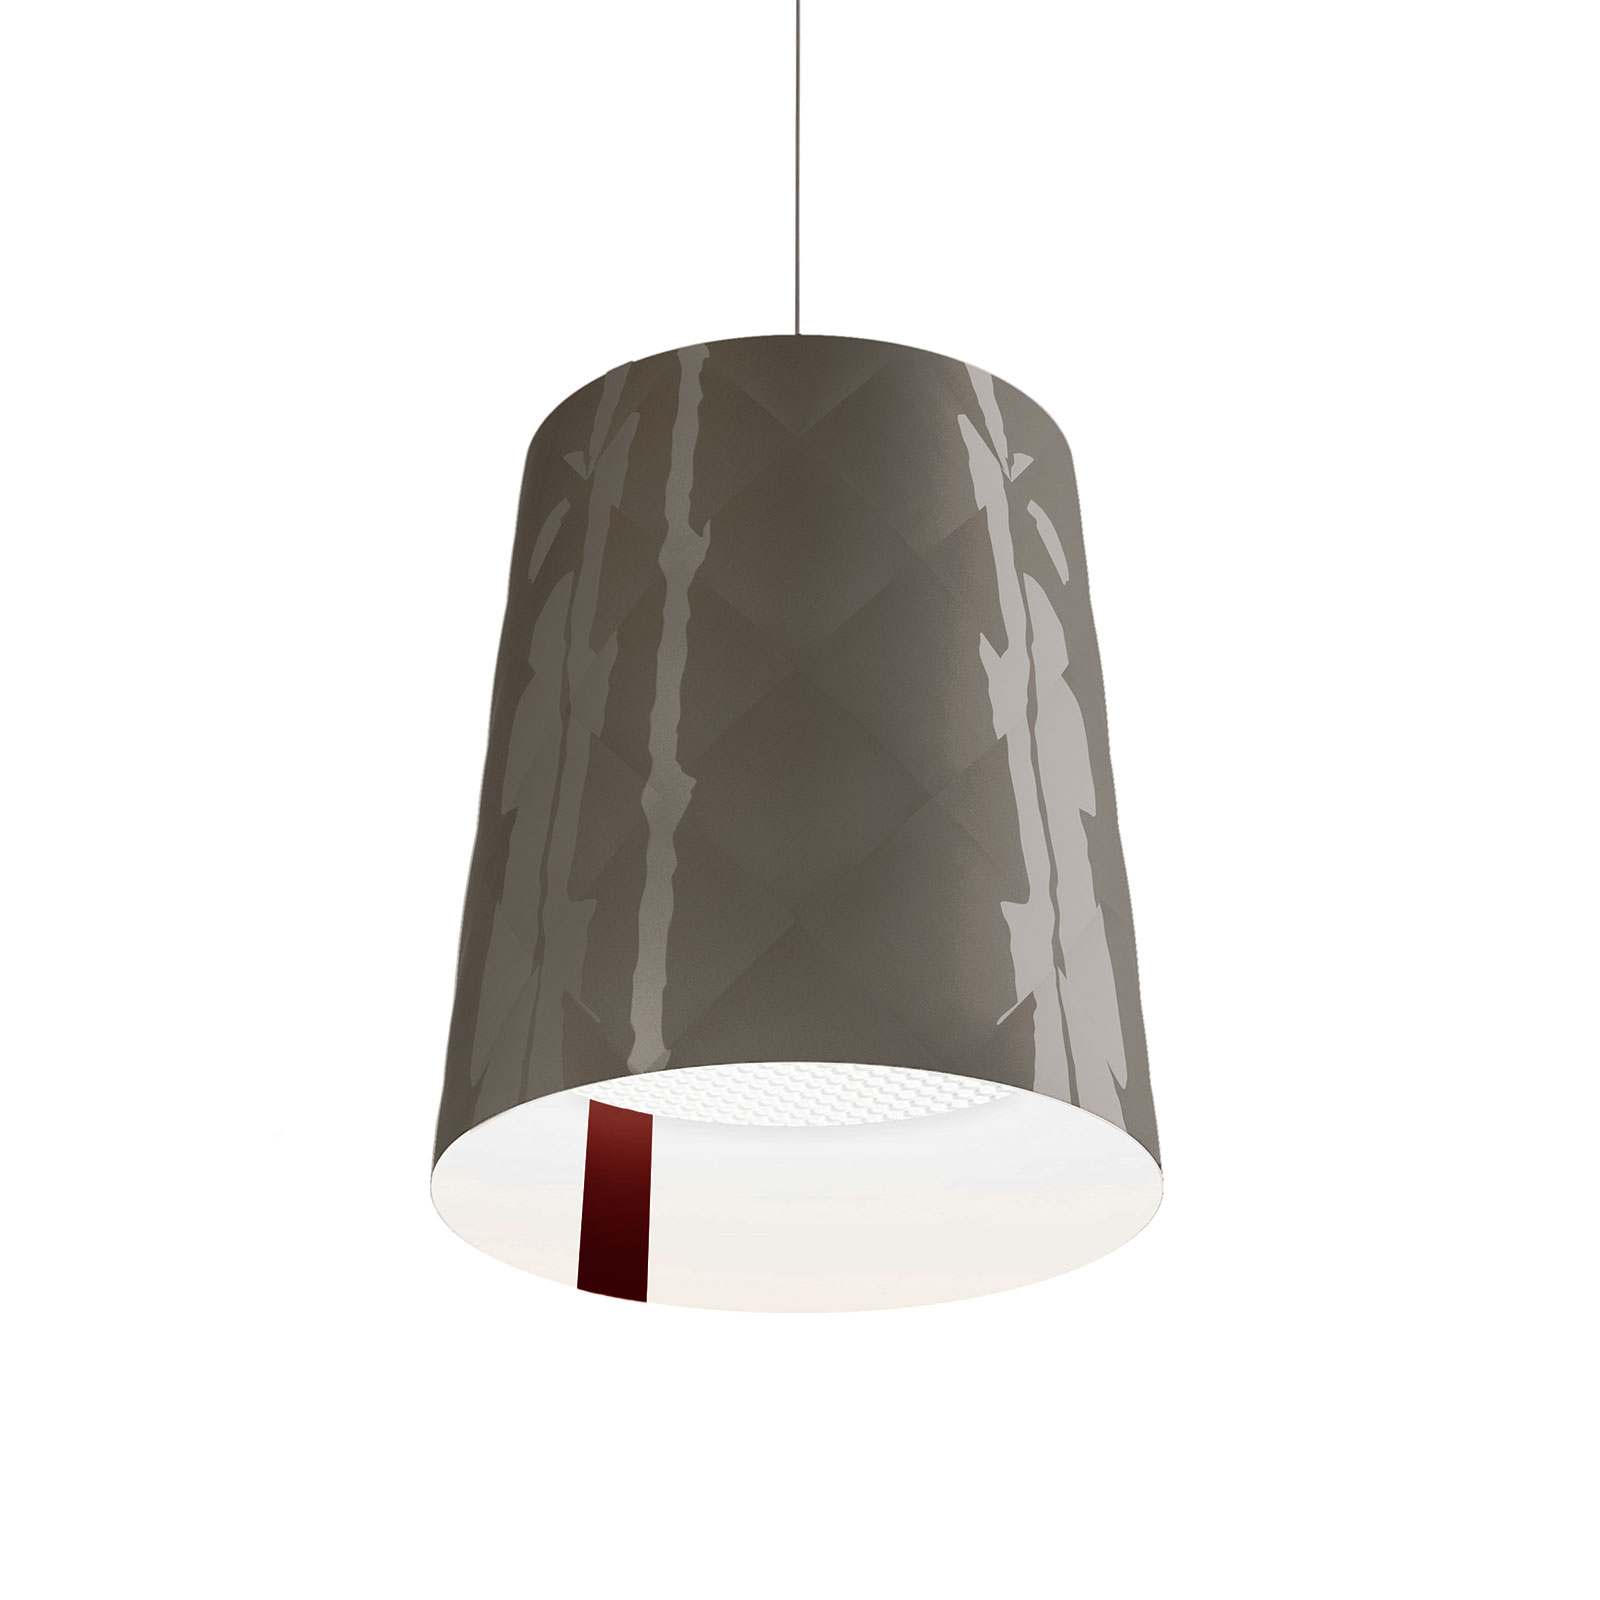 Kundalini New York lampa wisząca, Ø 33 cm, szara